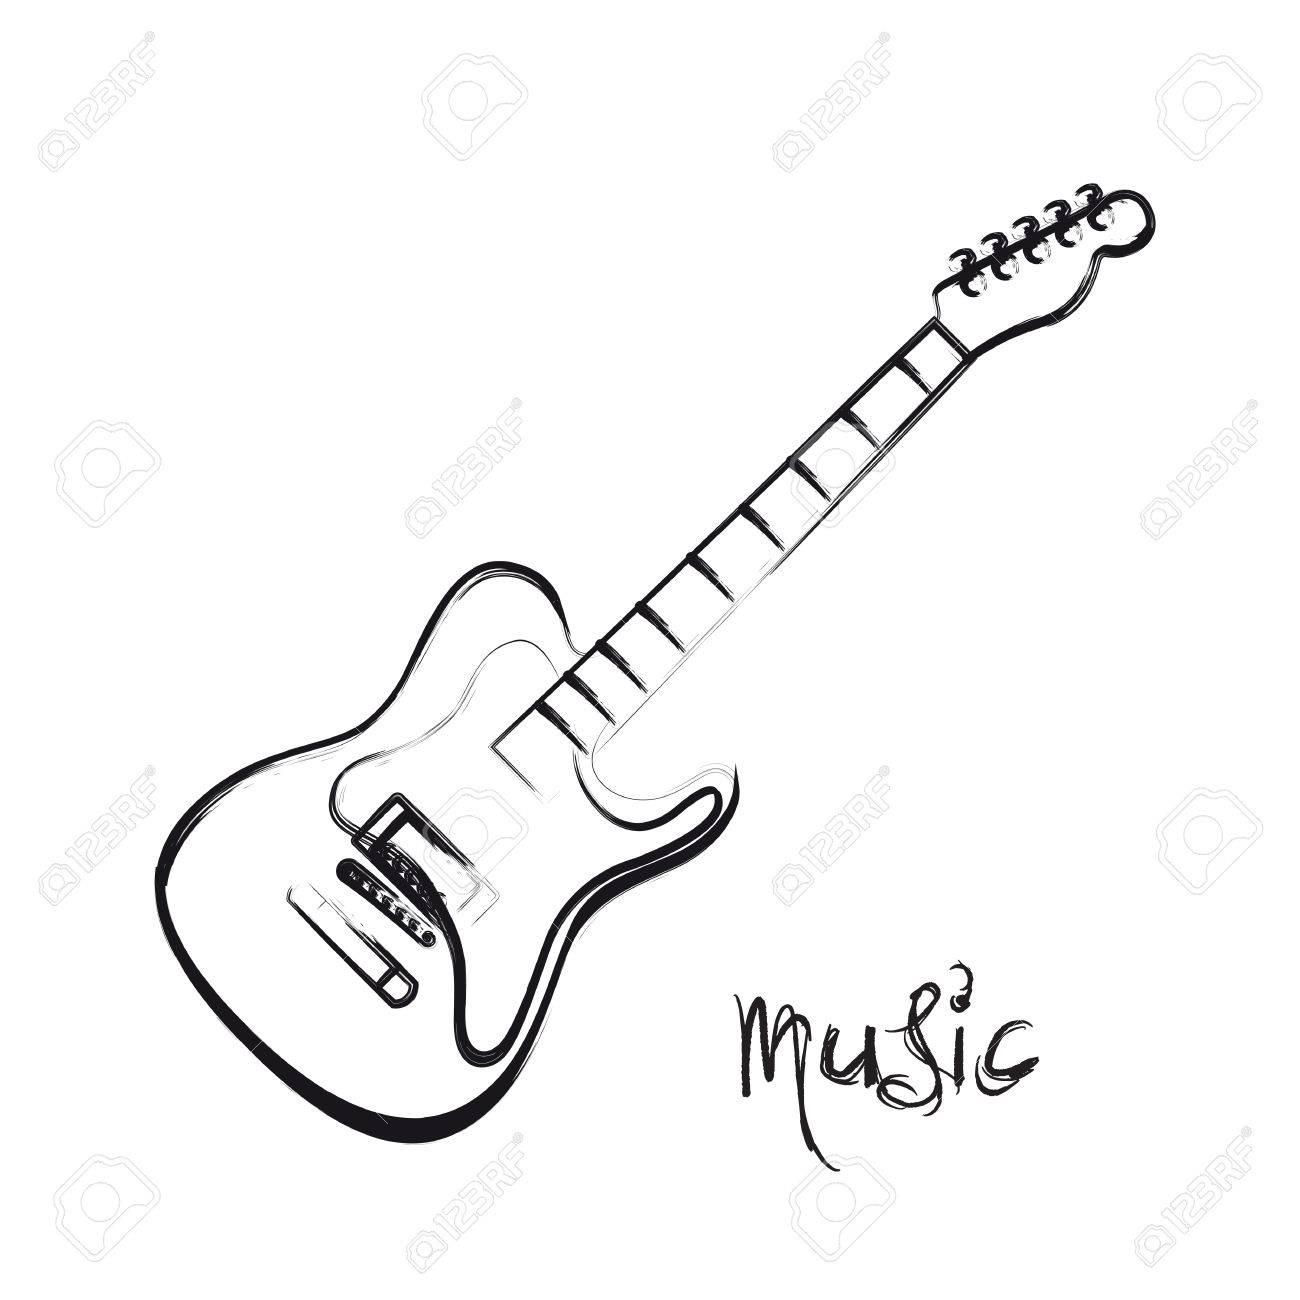 1300x1300 Electric Guitar Hand Drawn, Easy All Editable Royalty Free